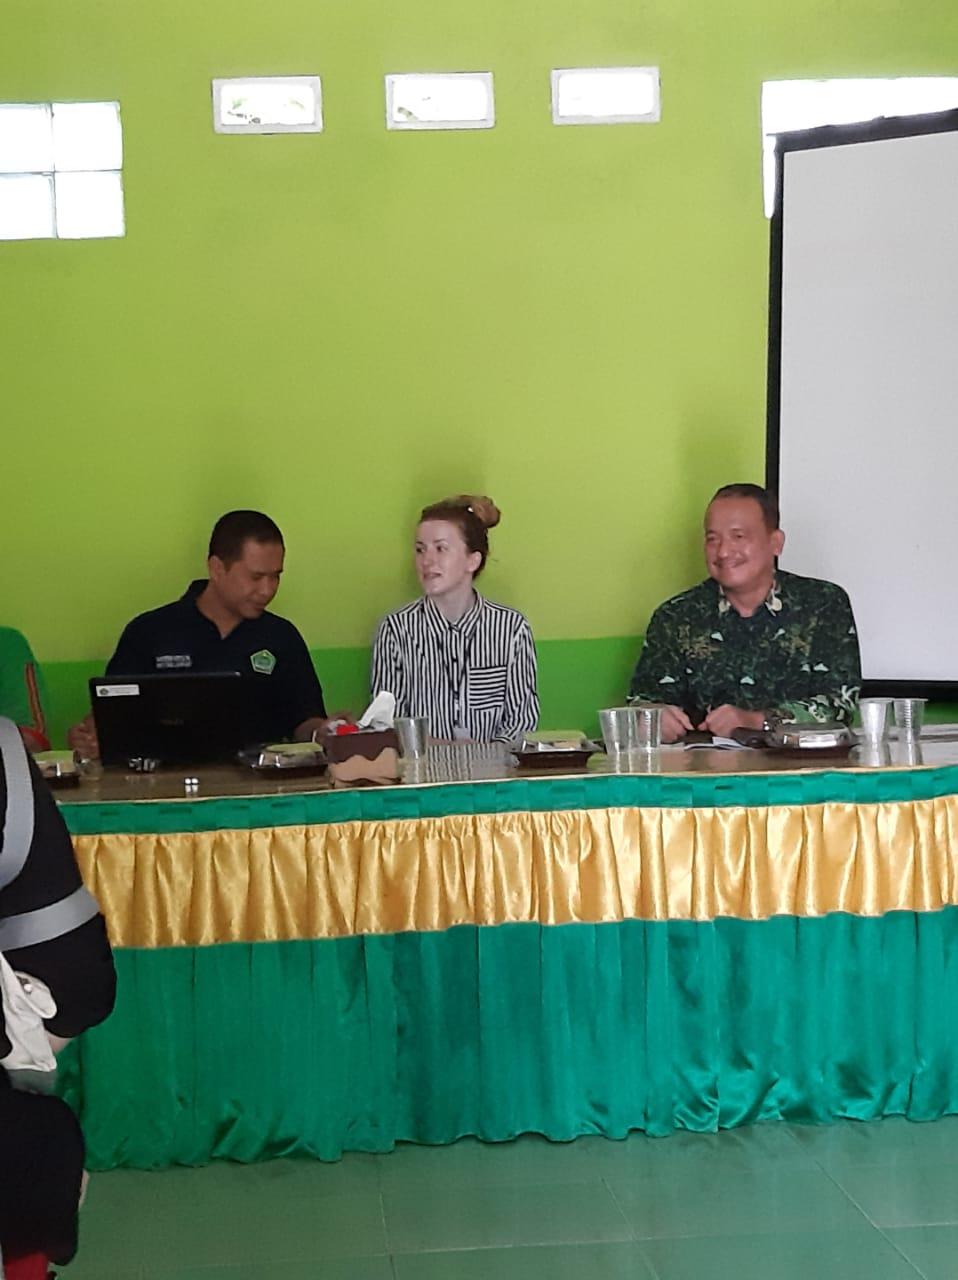 Welcome to State Islamic JHS 1 Bandar Lampung, Miss Marketa